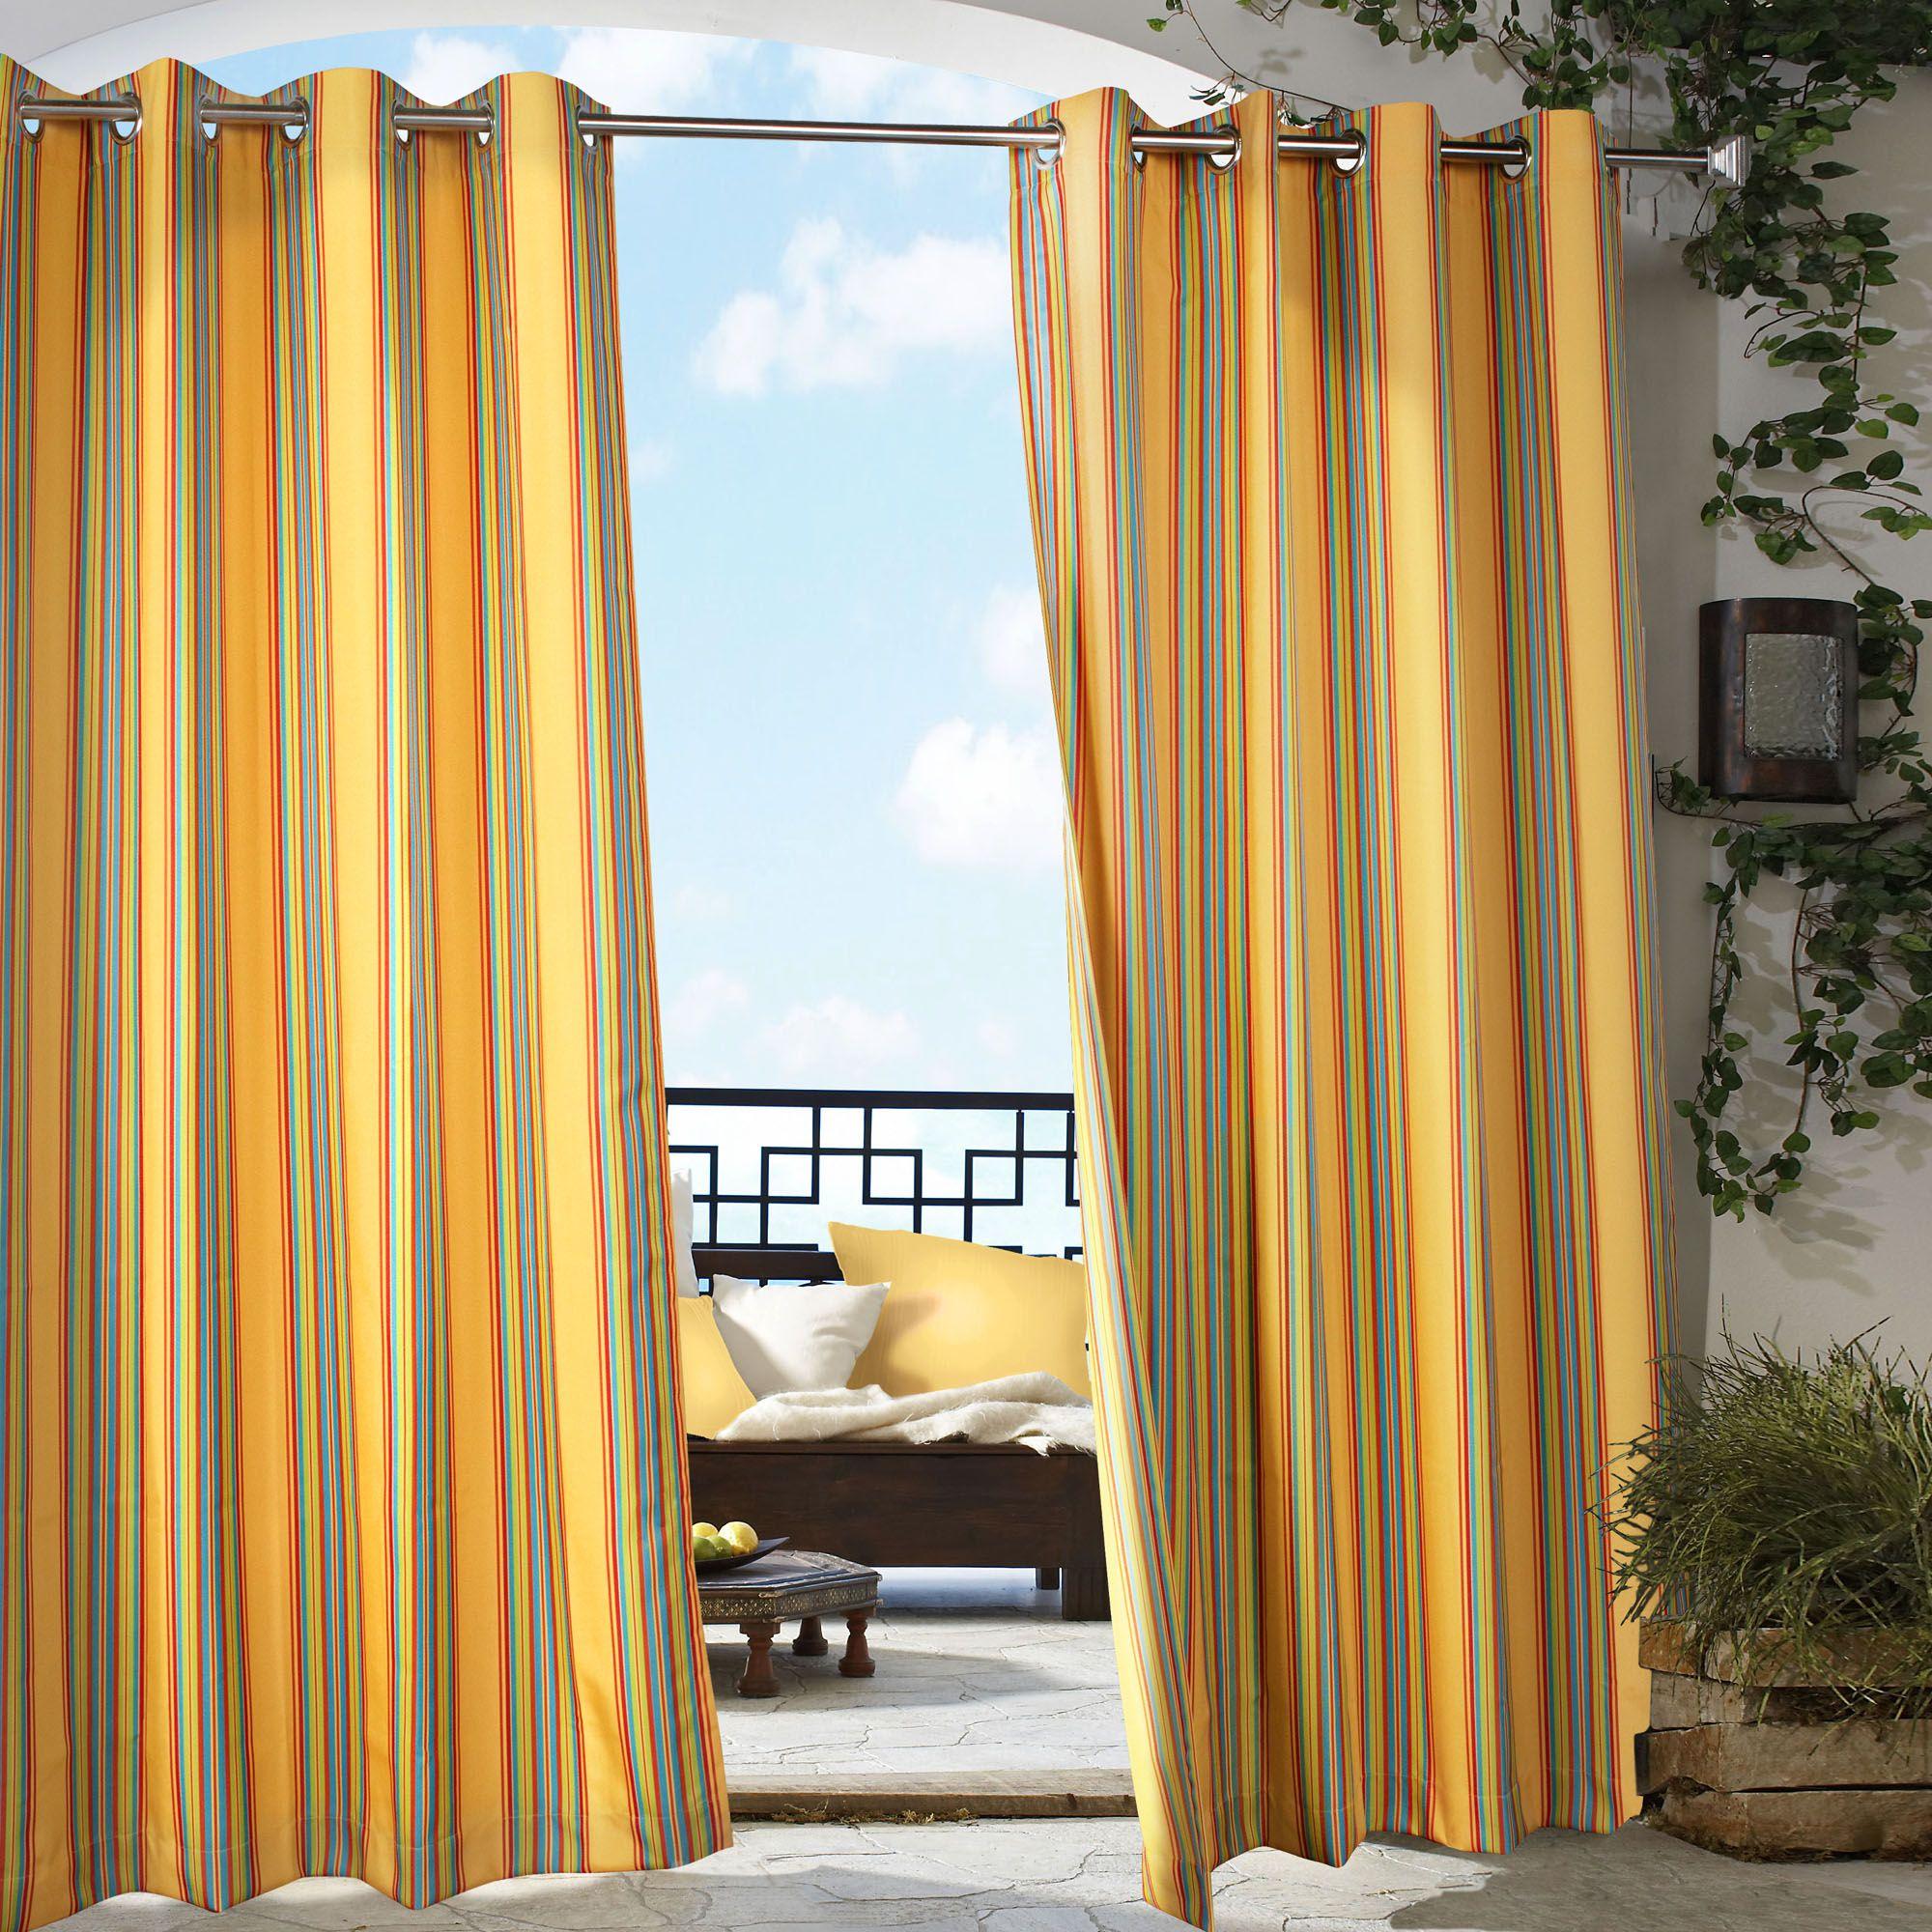 Balcony Curtains Outdoor